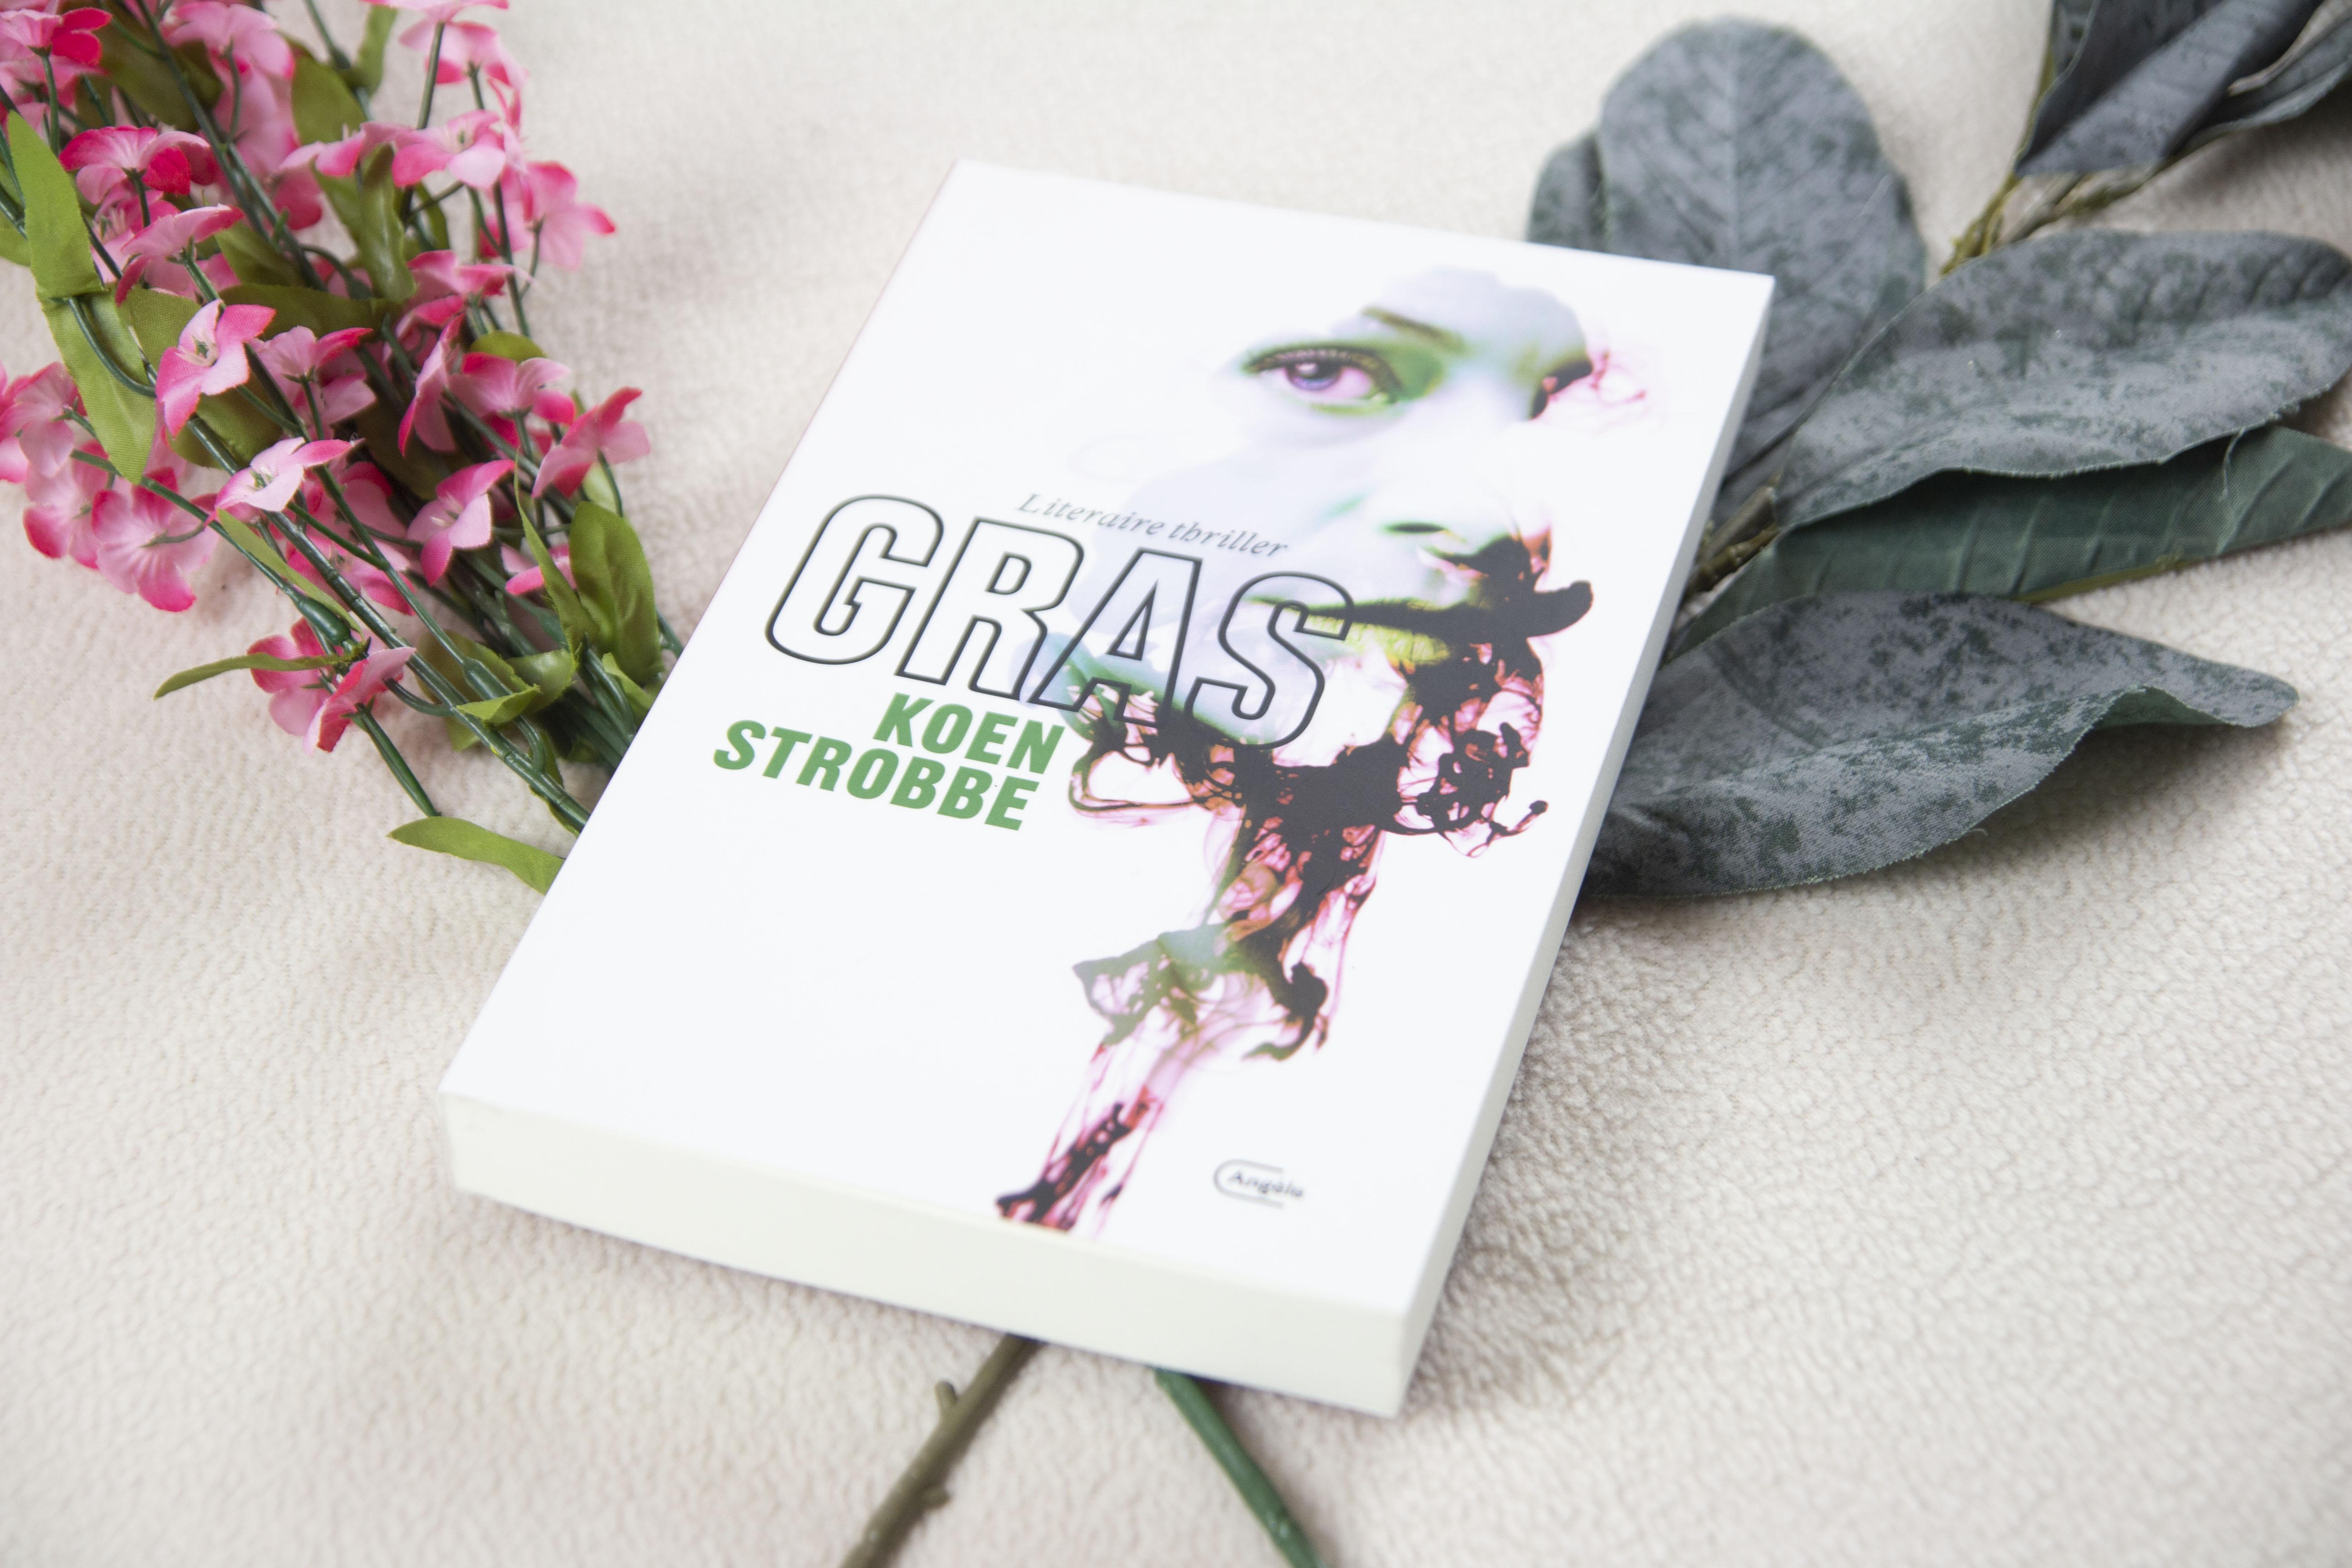 Gras – Koen Strobbe